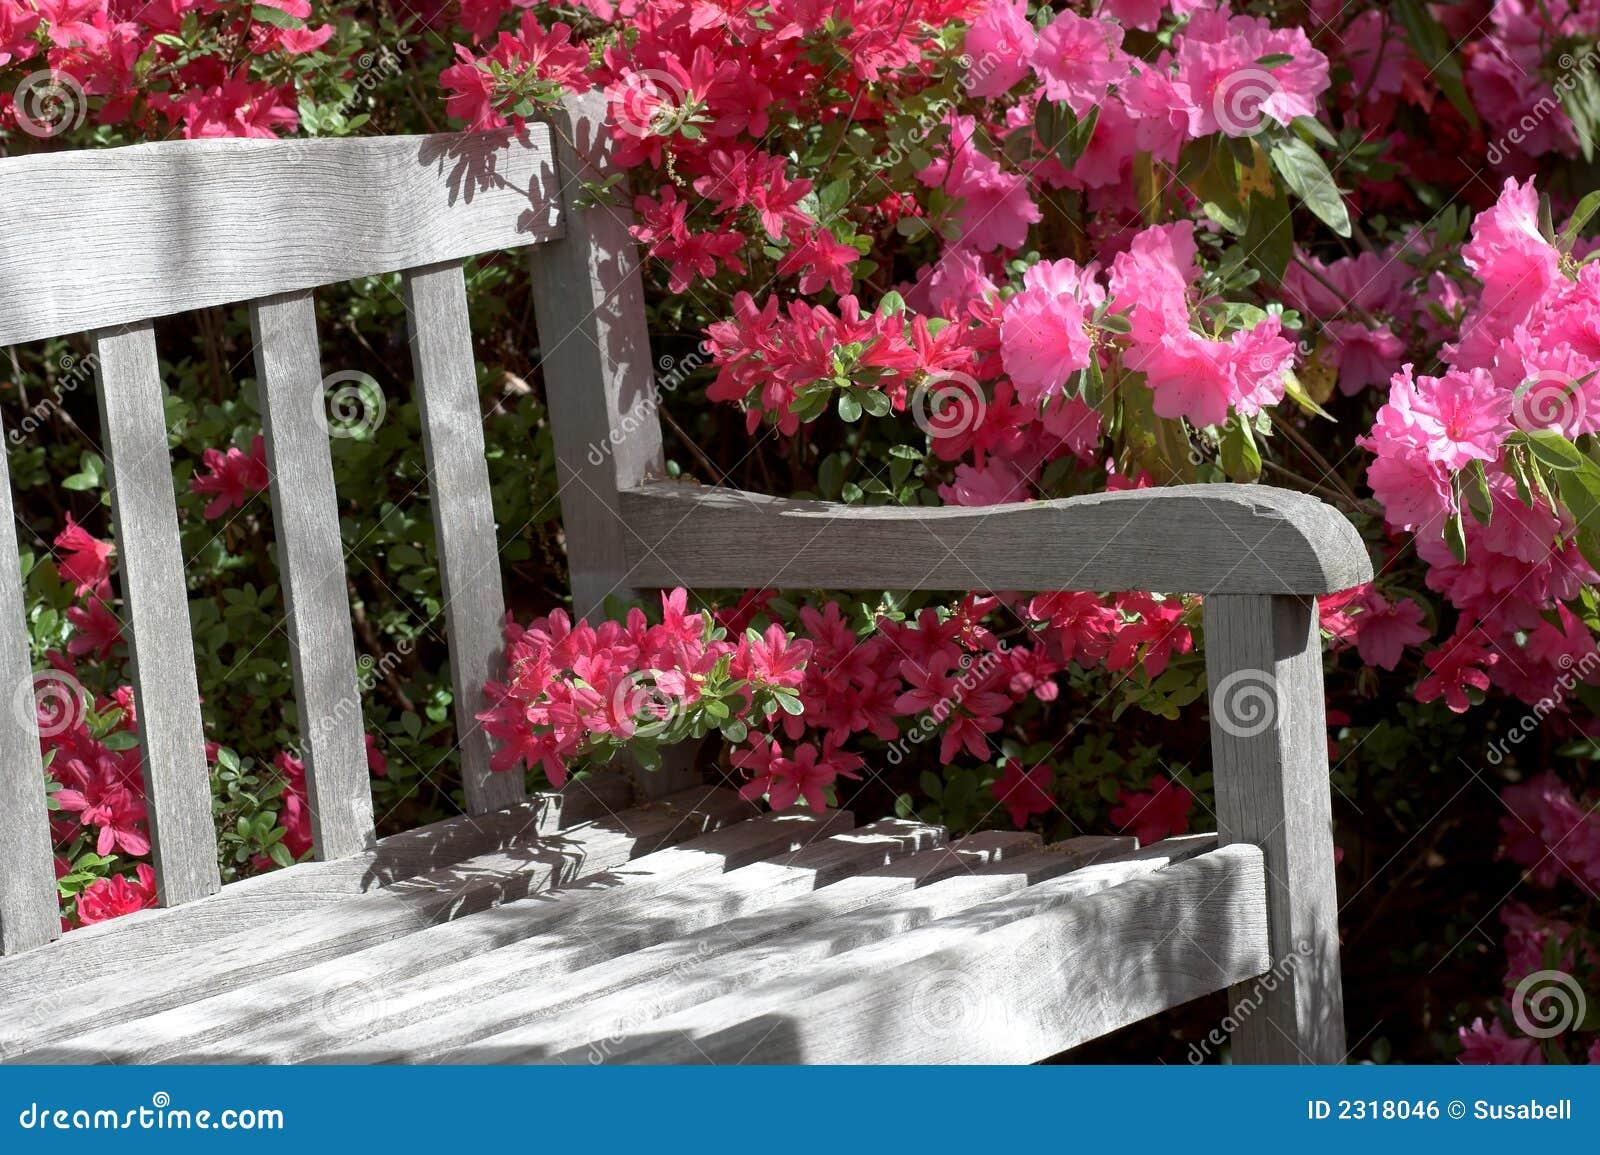 Garden Bench And Flowers Stock Photo Image Of Azalea